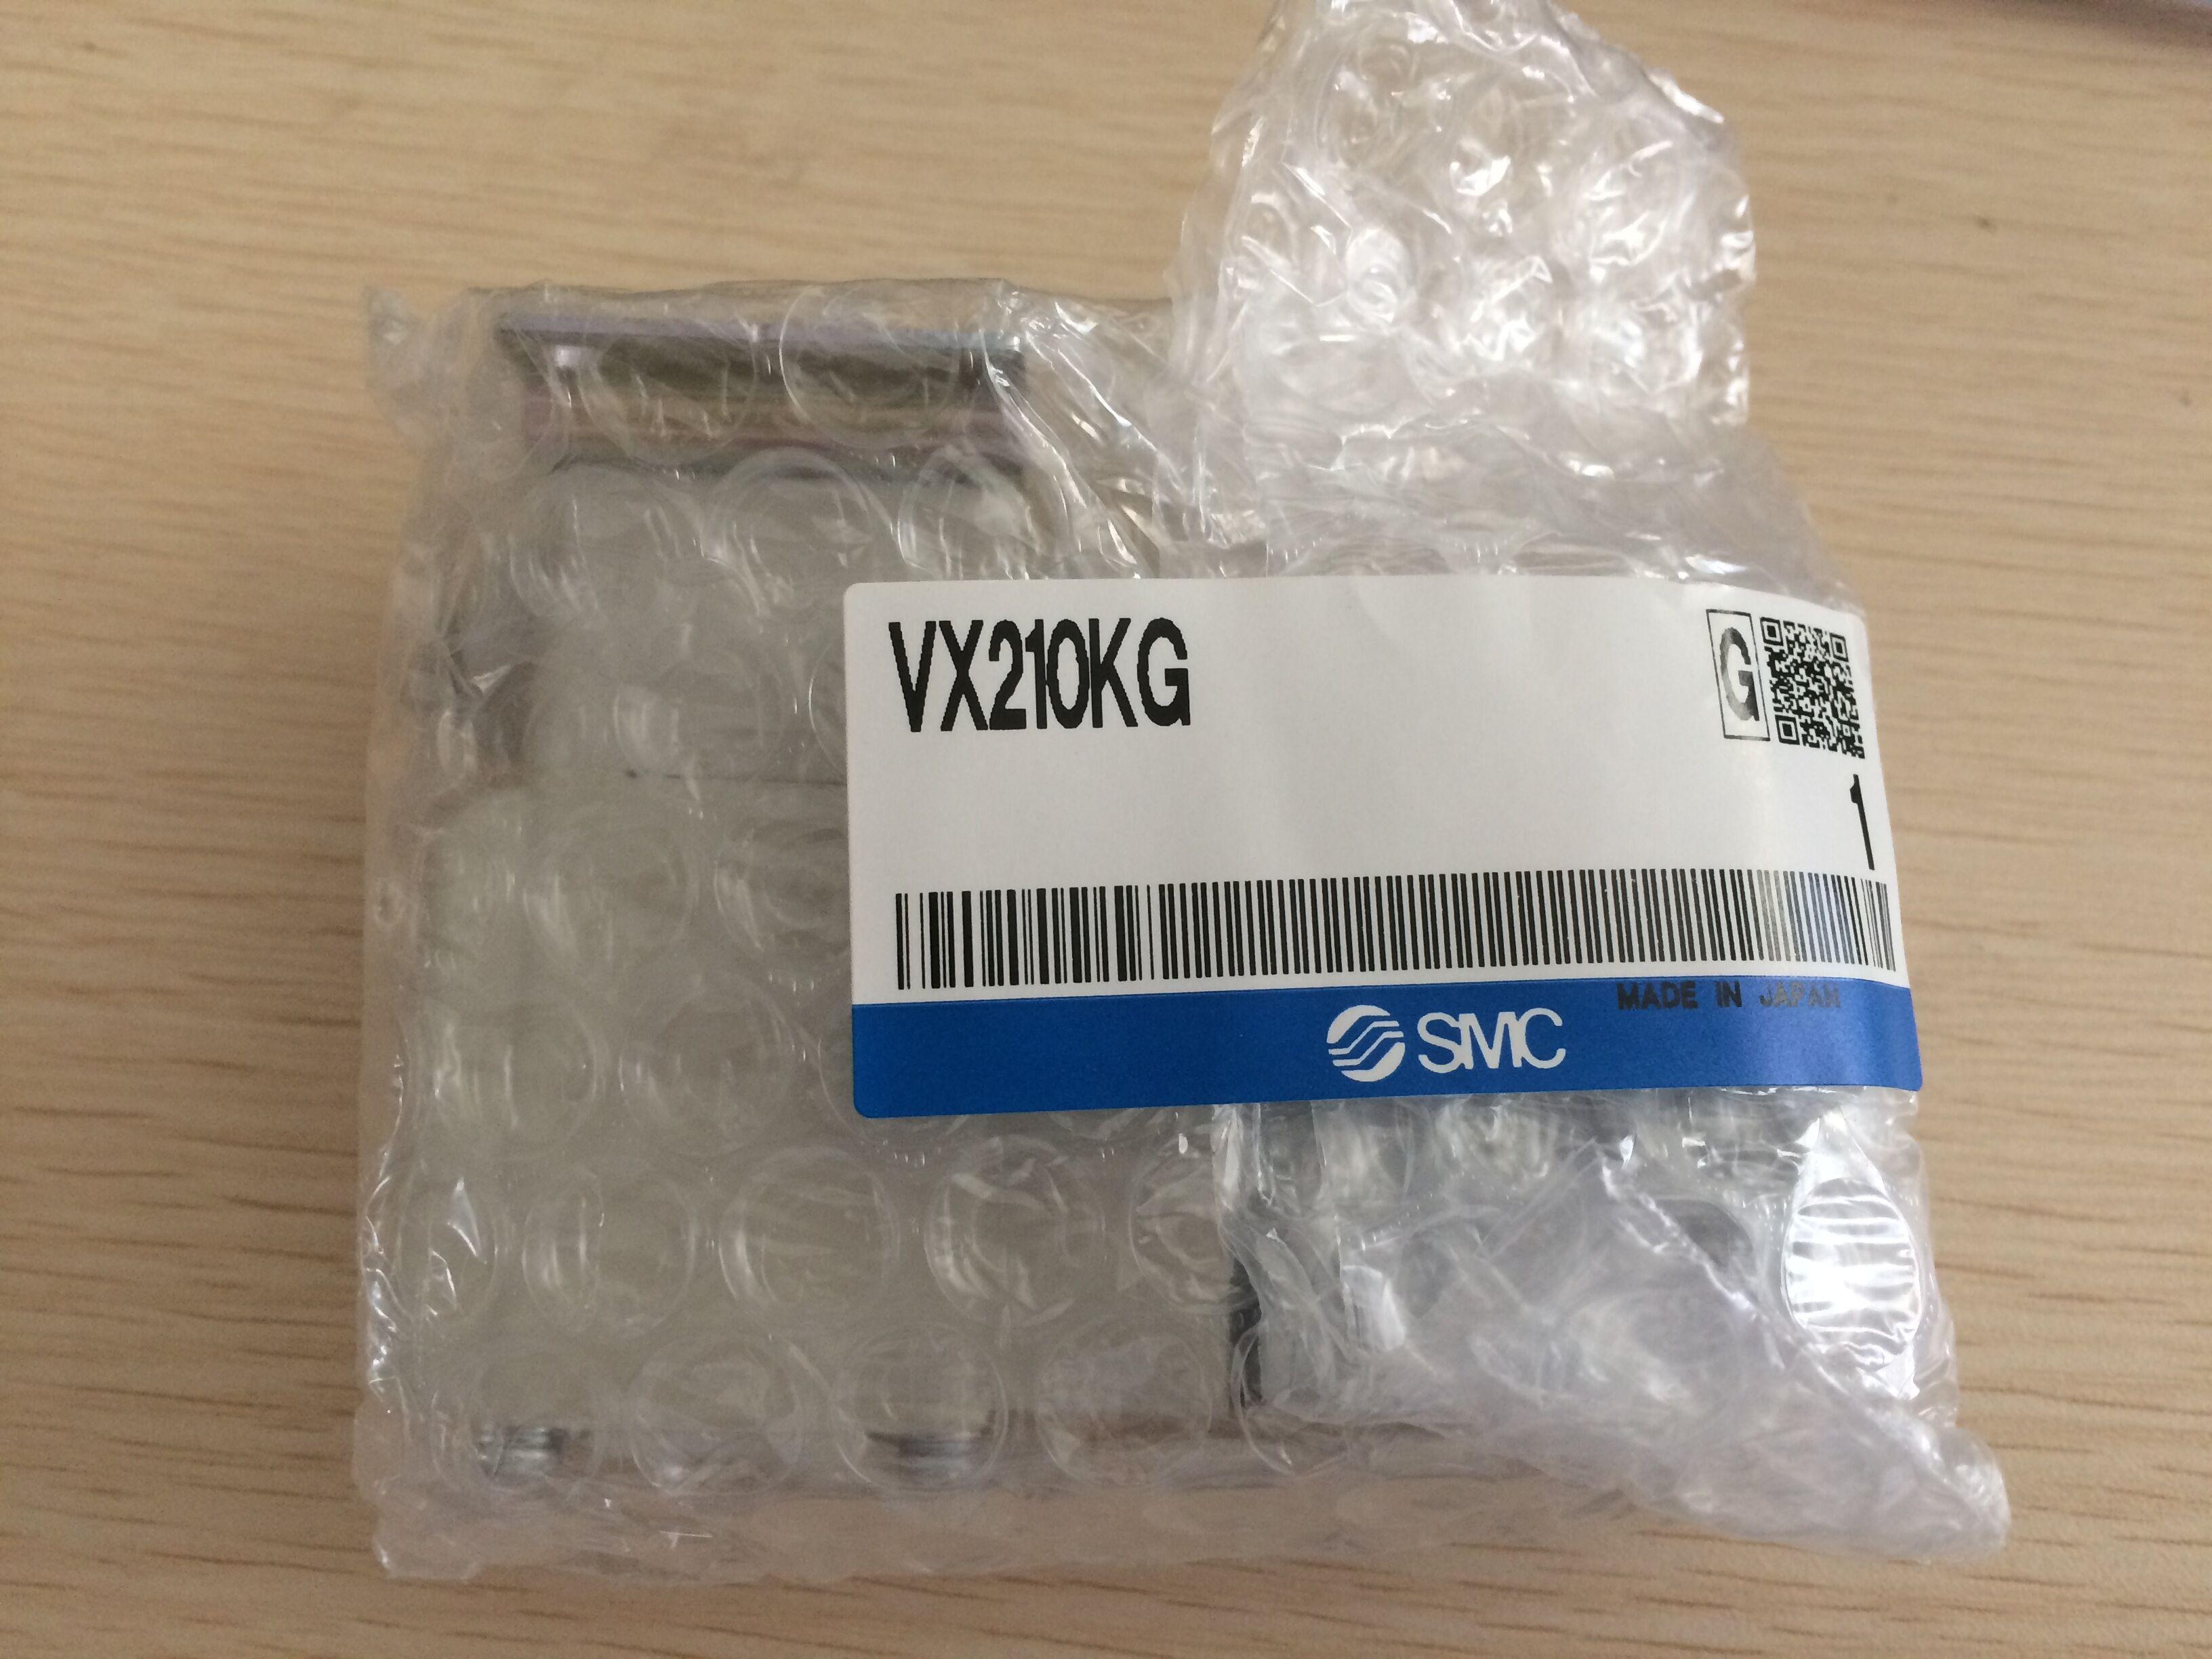 Japan SMC genuine genuine direct acting solenoid valve, air monomer VX210KG false one penalty ten!